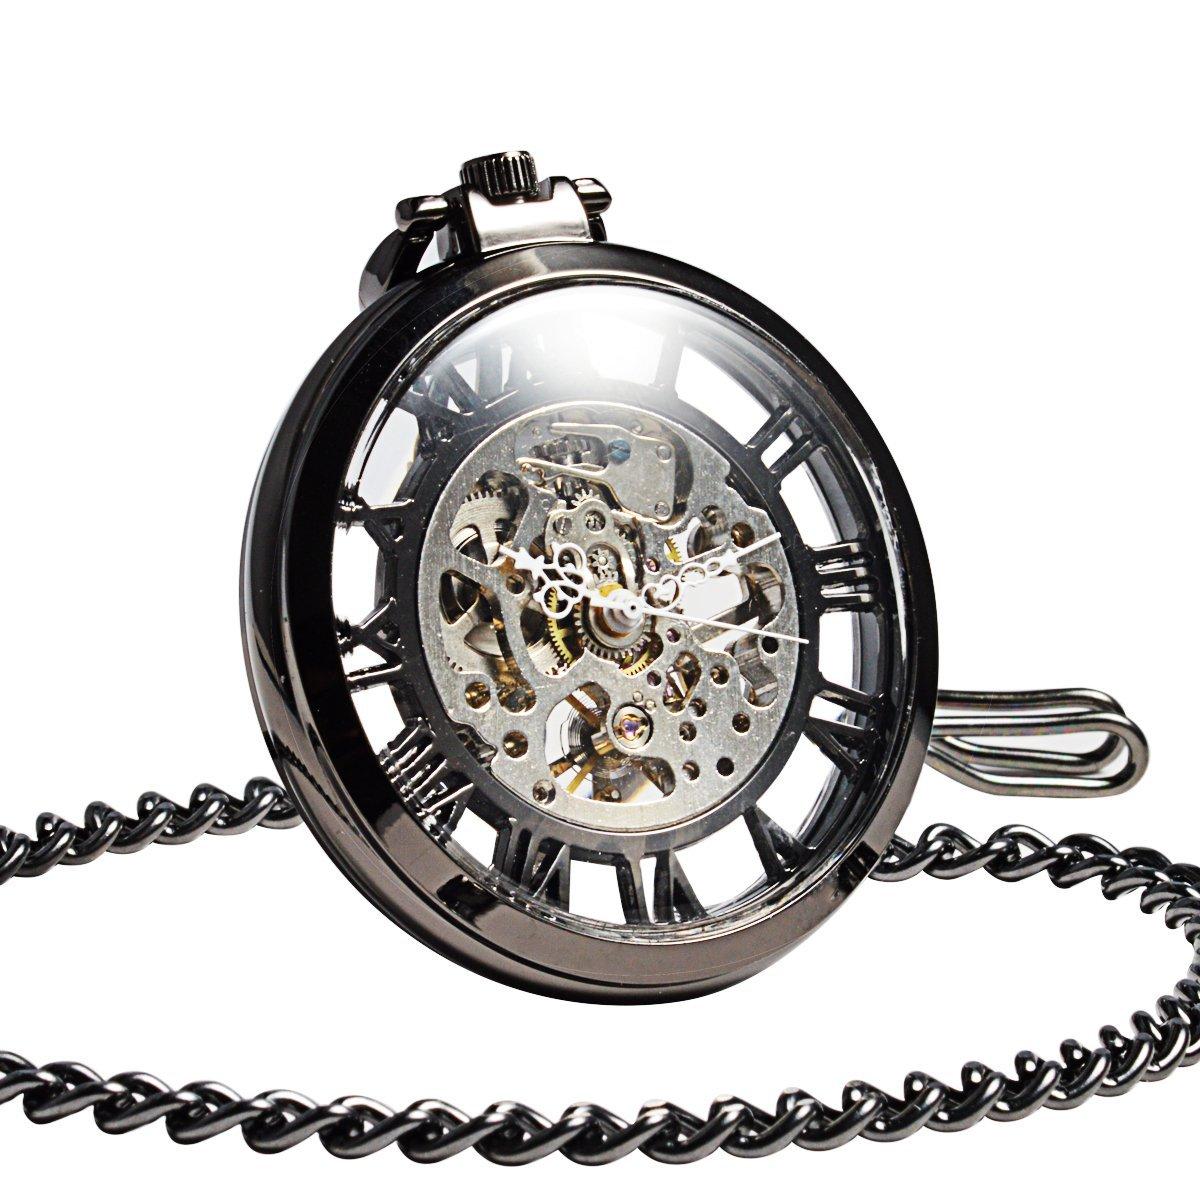 ManChDa Steampunk Mechanical Black Skeleton Big Size Hand Winding Pocket Watch Open Face Fob for Men